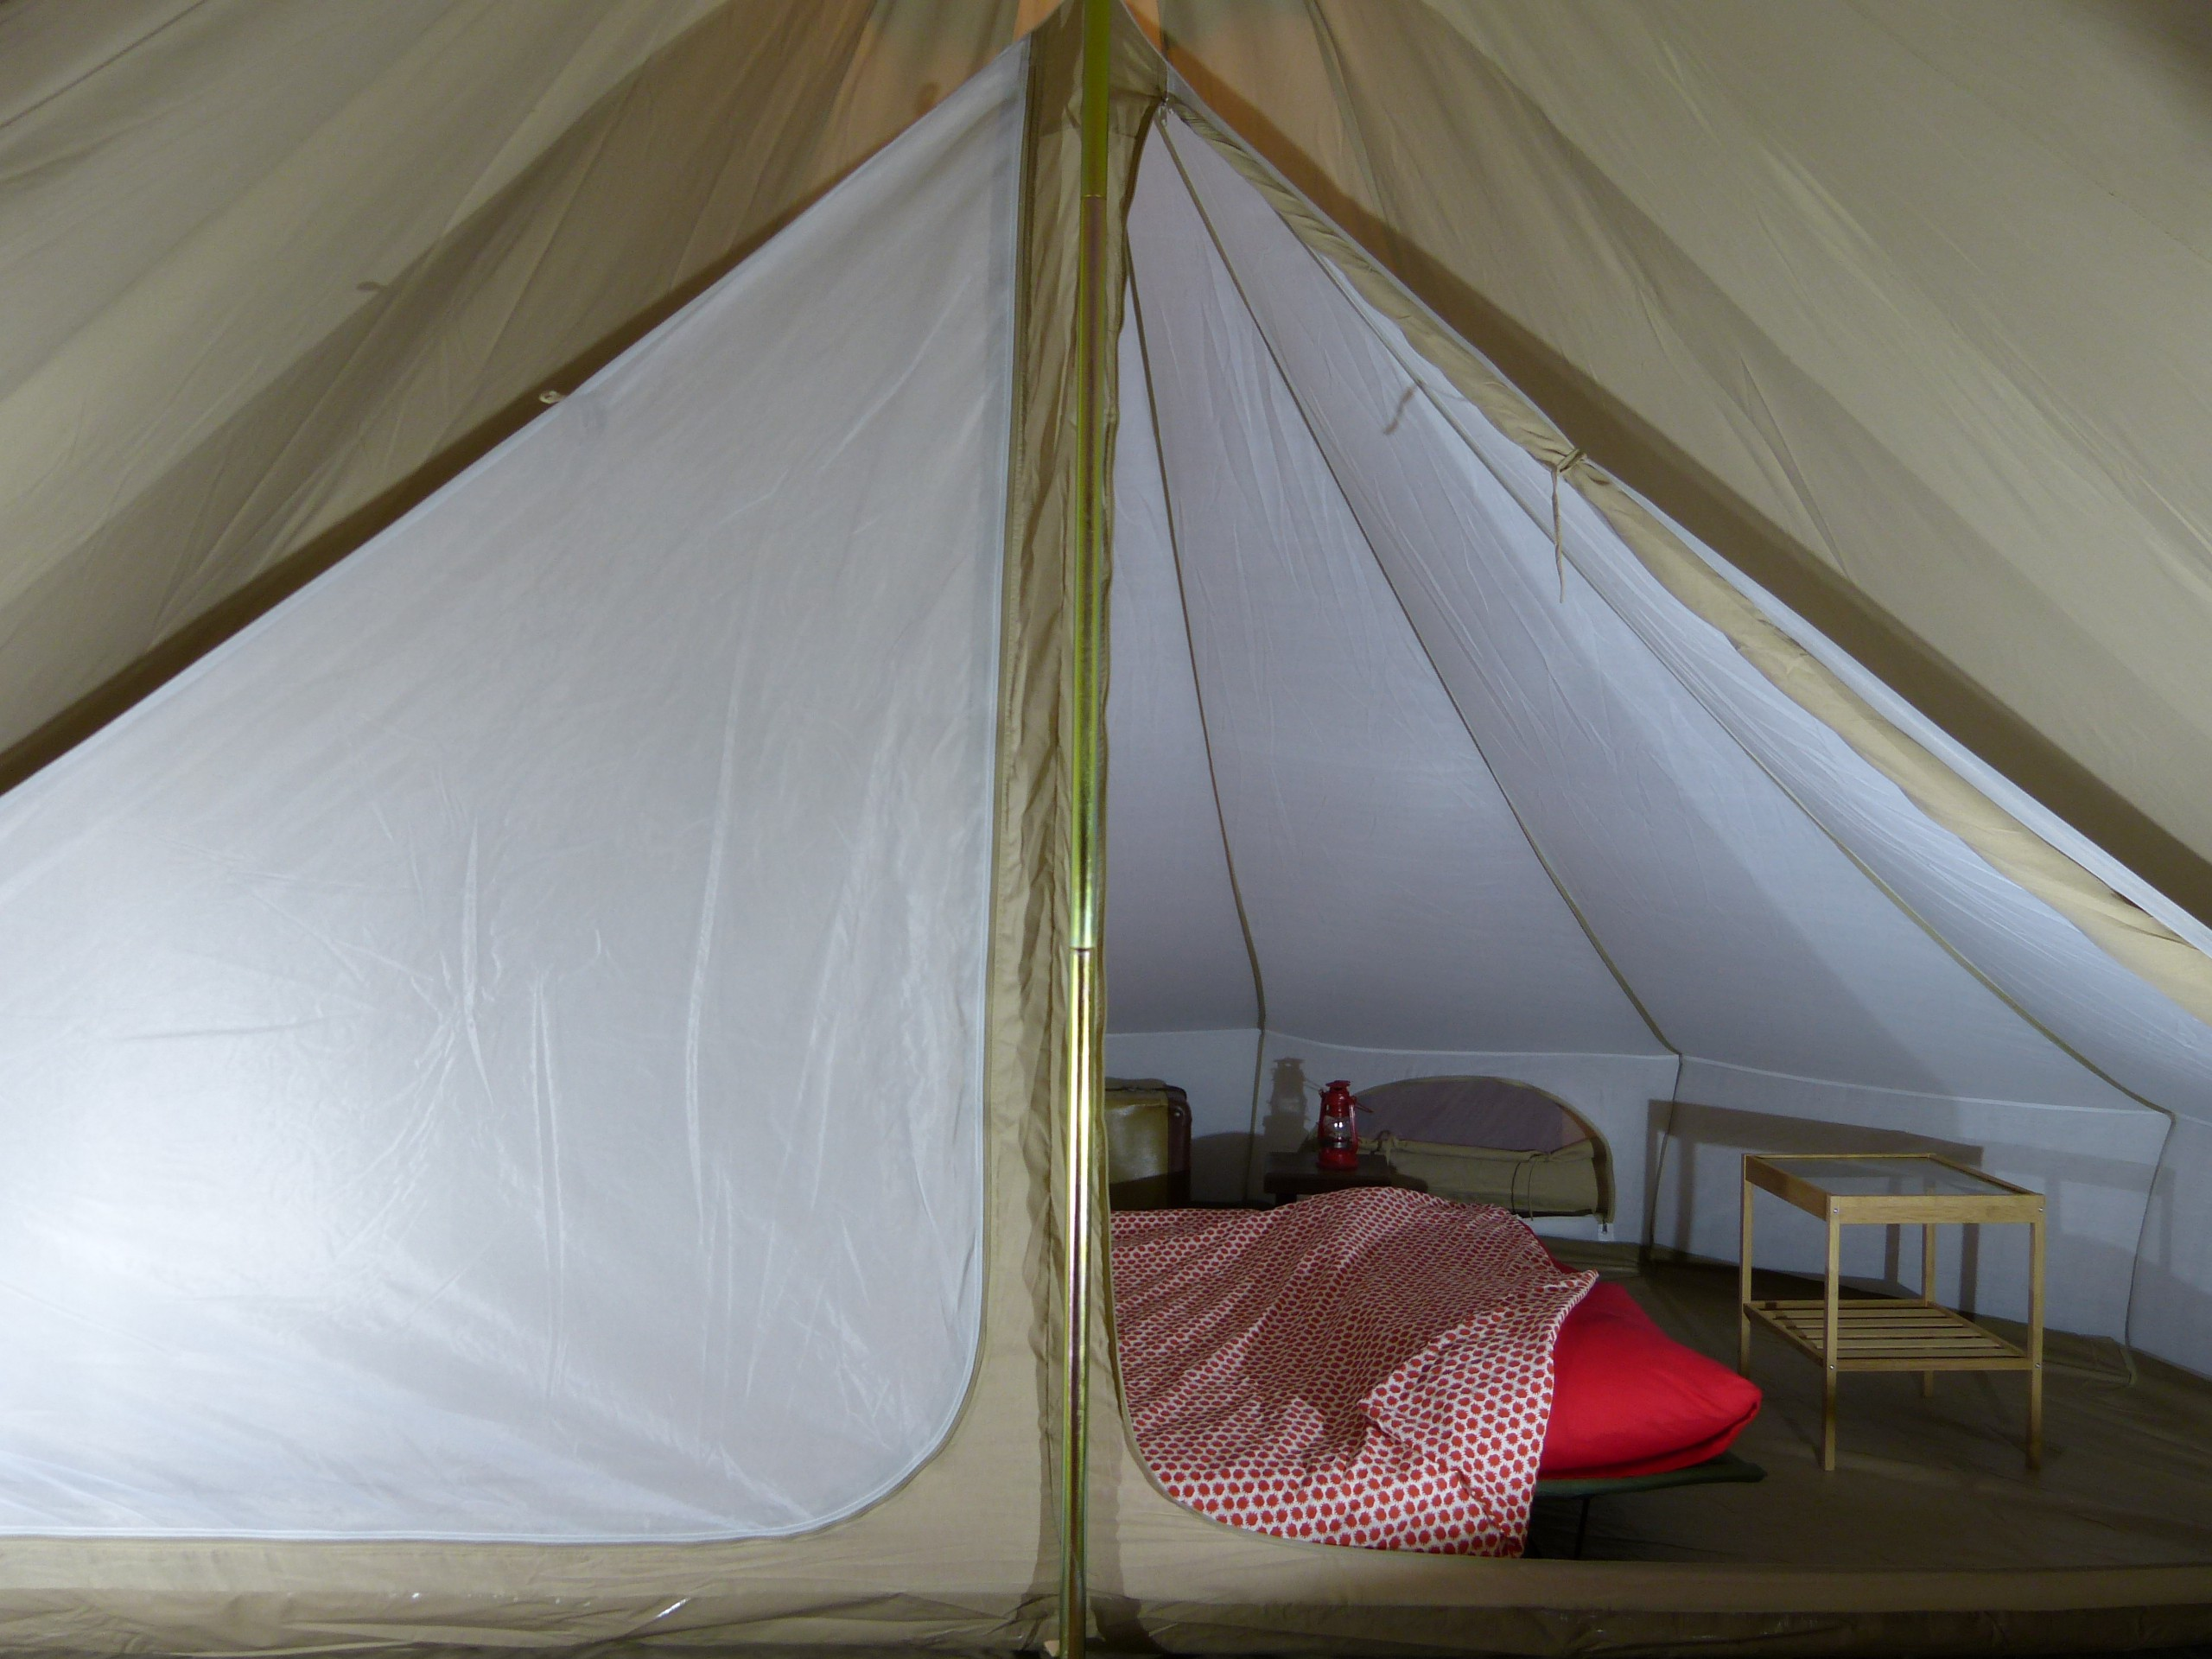 tente intérieur sibley 450 ultimate